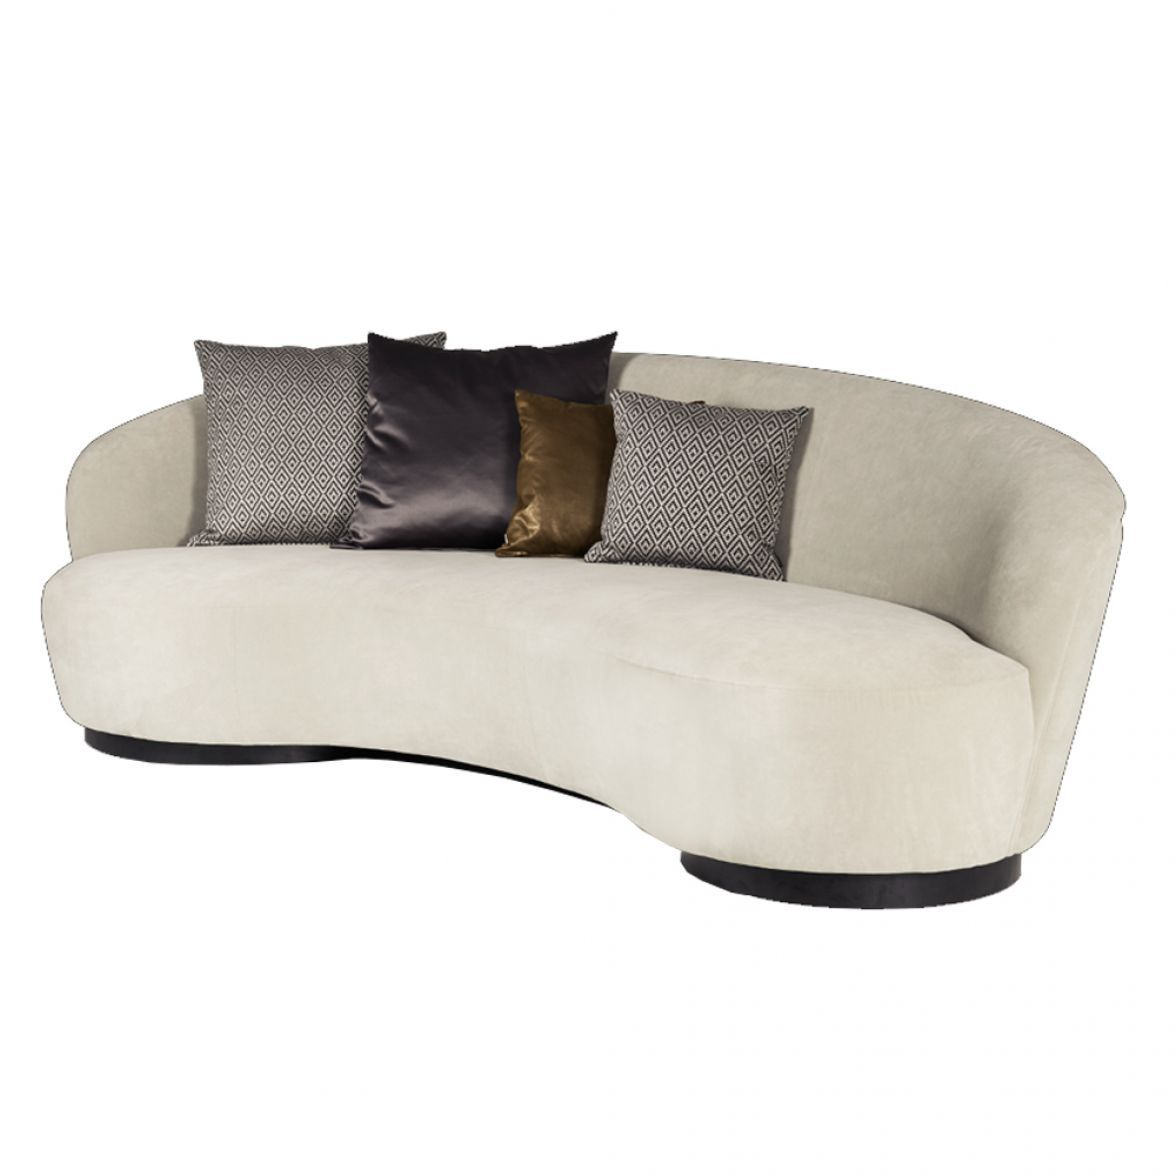 IGNACIO - L sofa